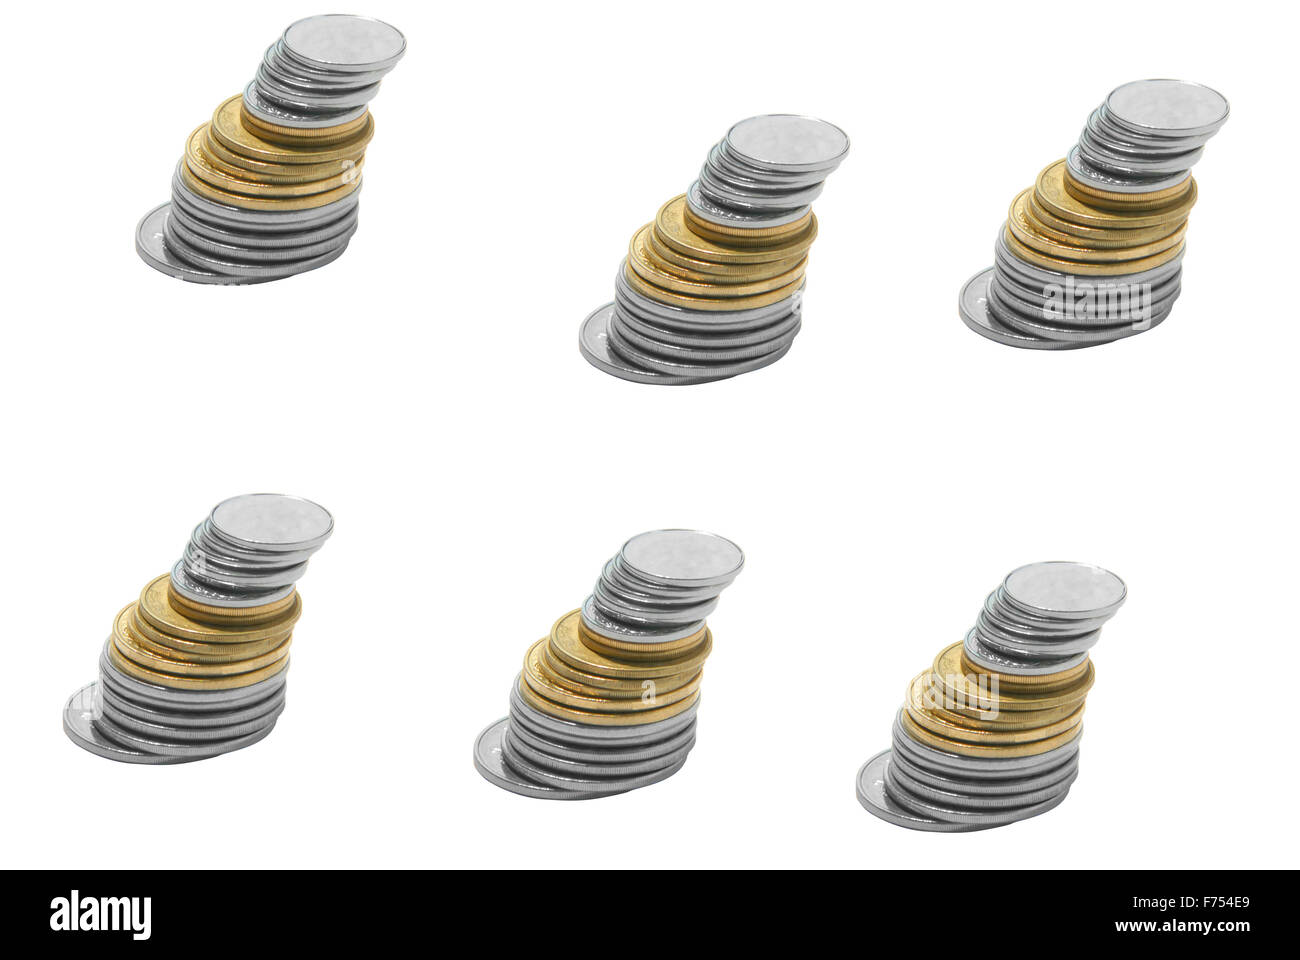 metal money isolatet on white Stock Photo